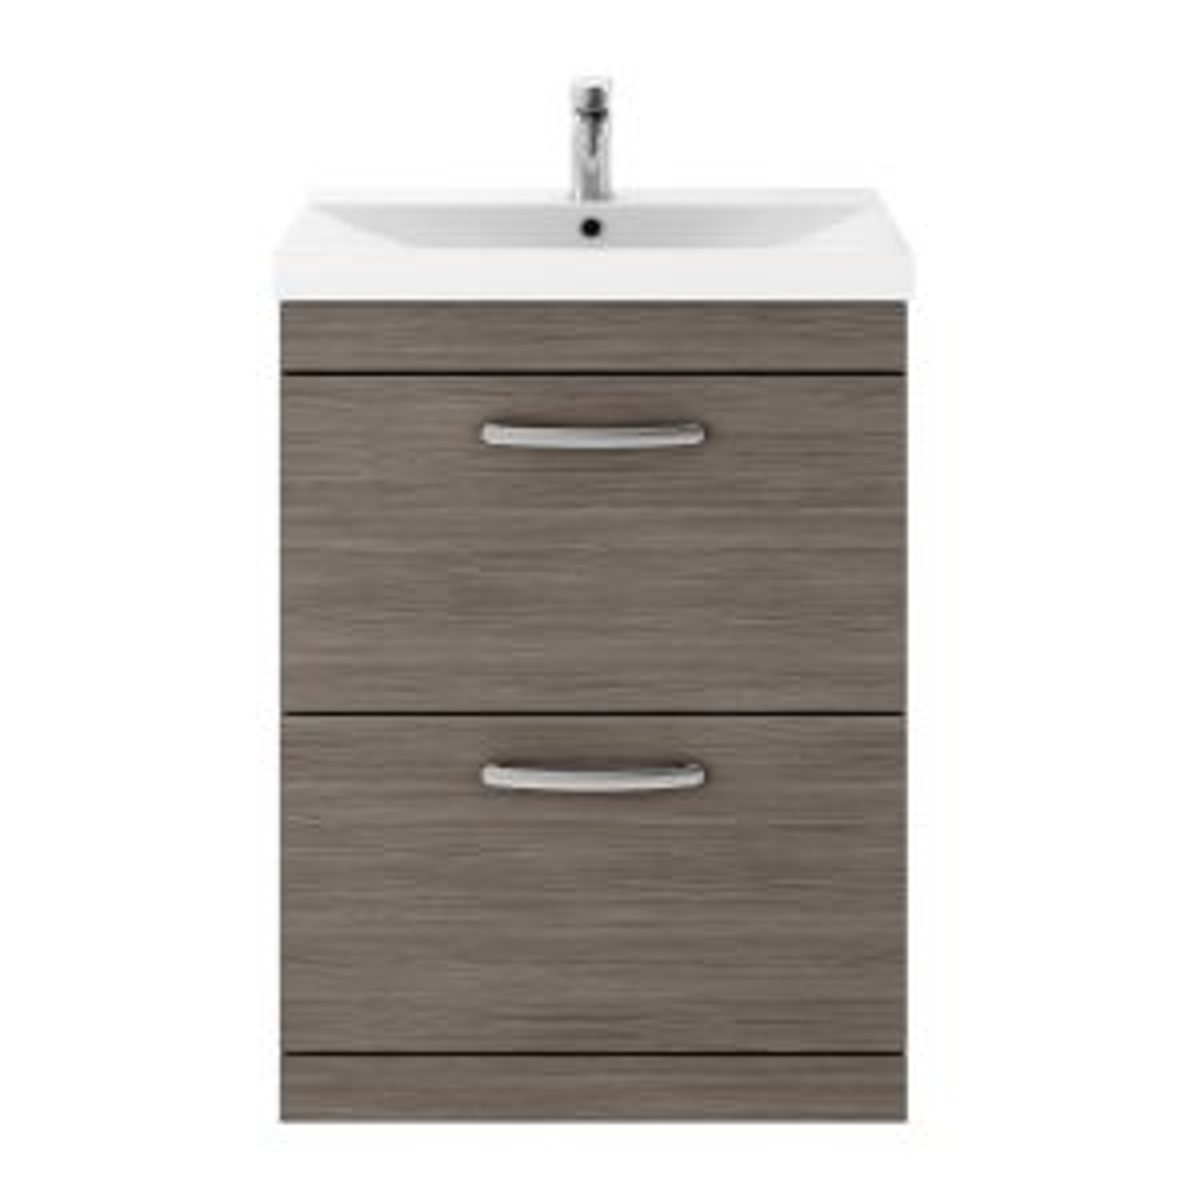 Nuie Athena Grey Avola 2 Drawer Floor Standing Vanity Unit with 50mm Profile Basin 600mm